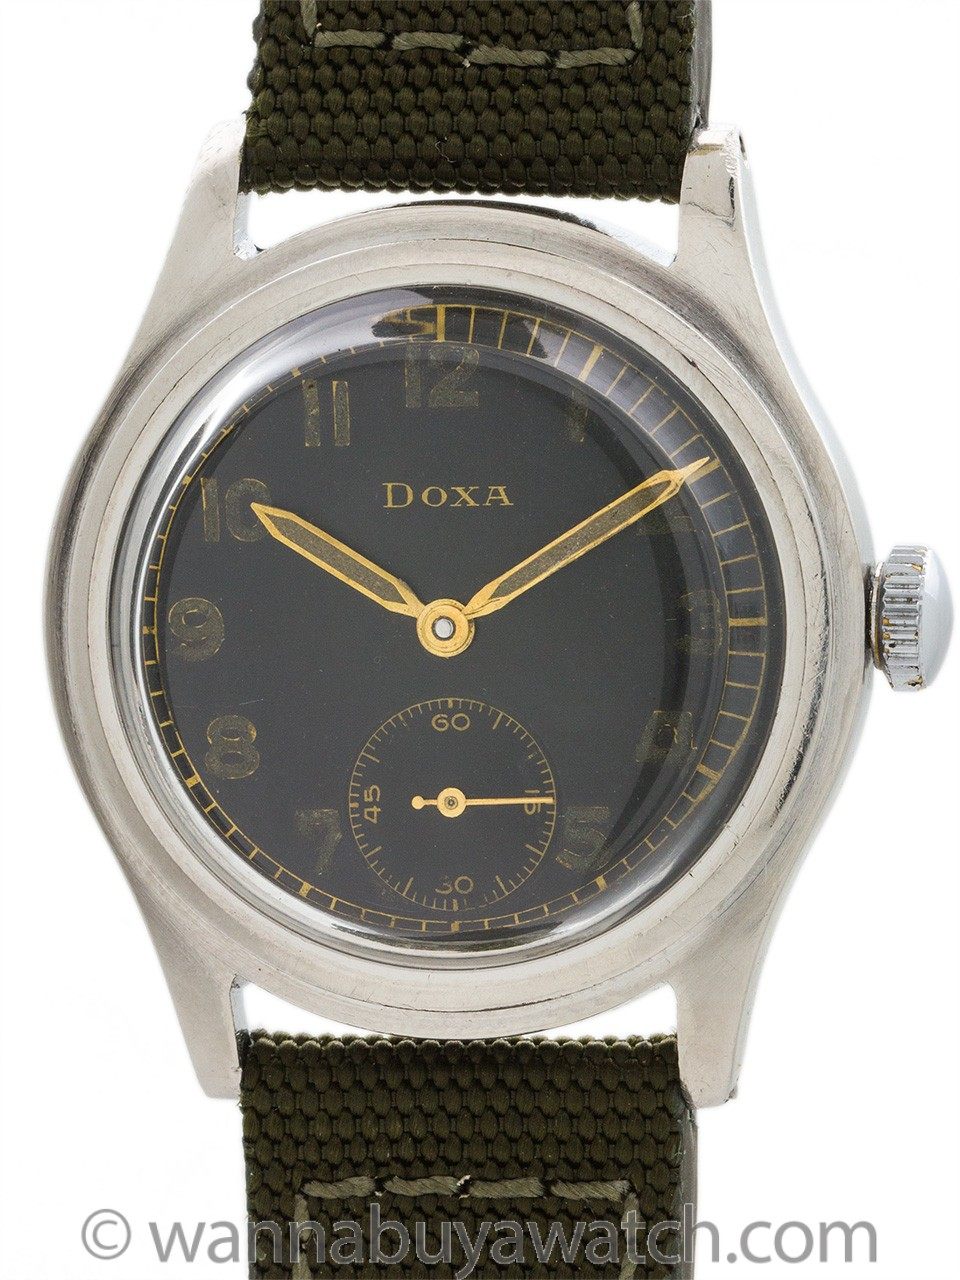 Doxa Military ref. 6525 circa 1940's